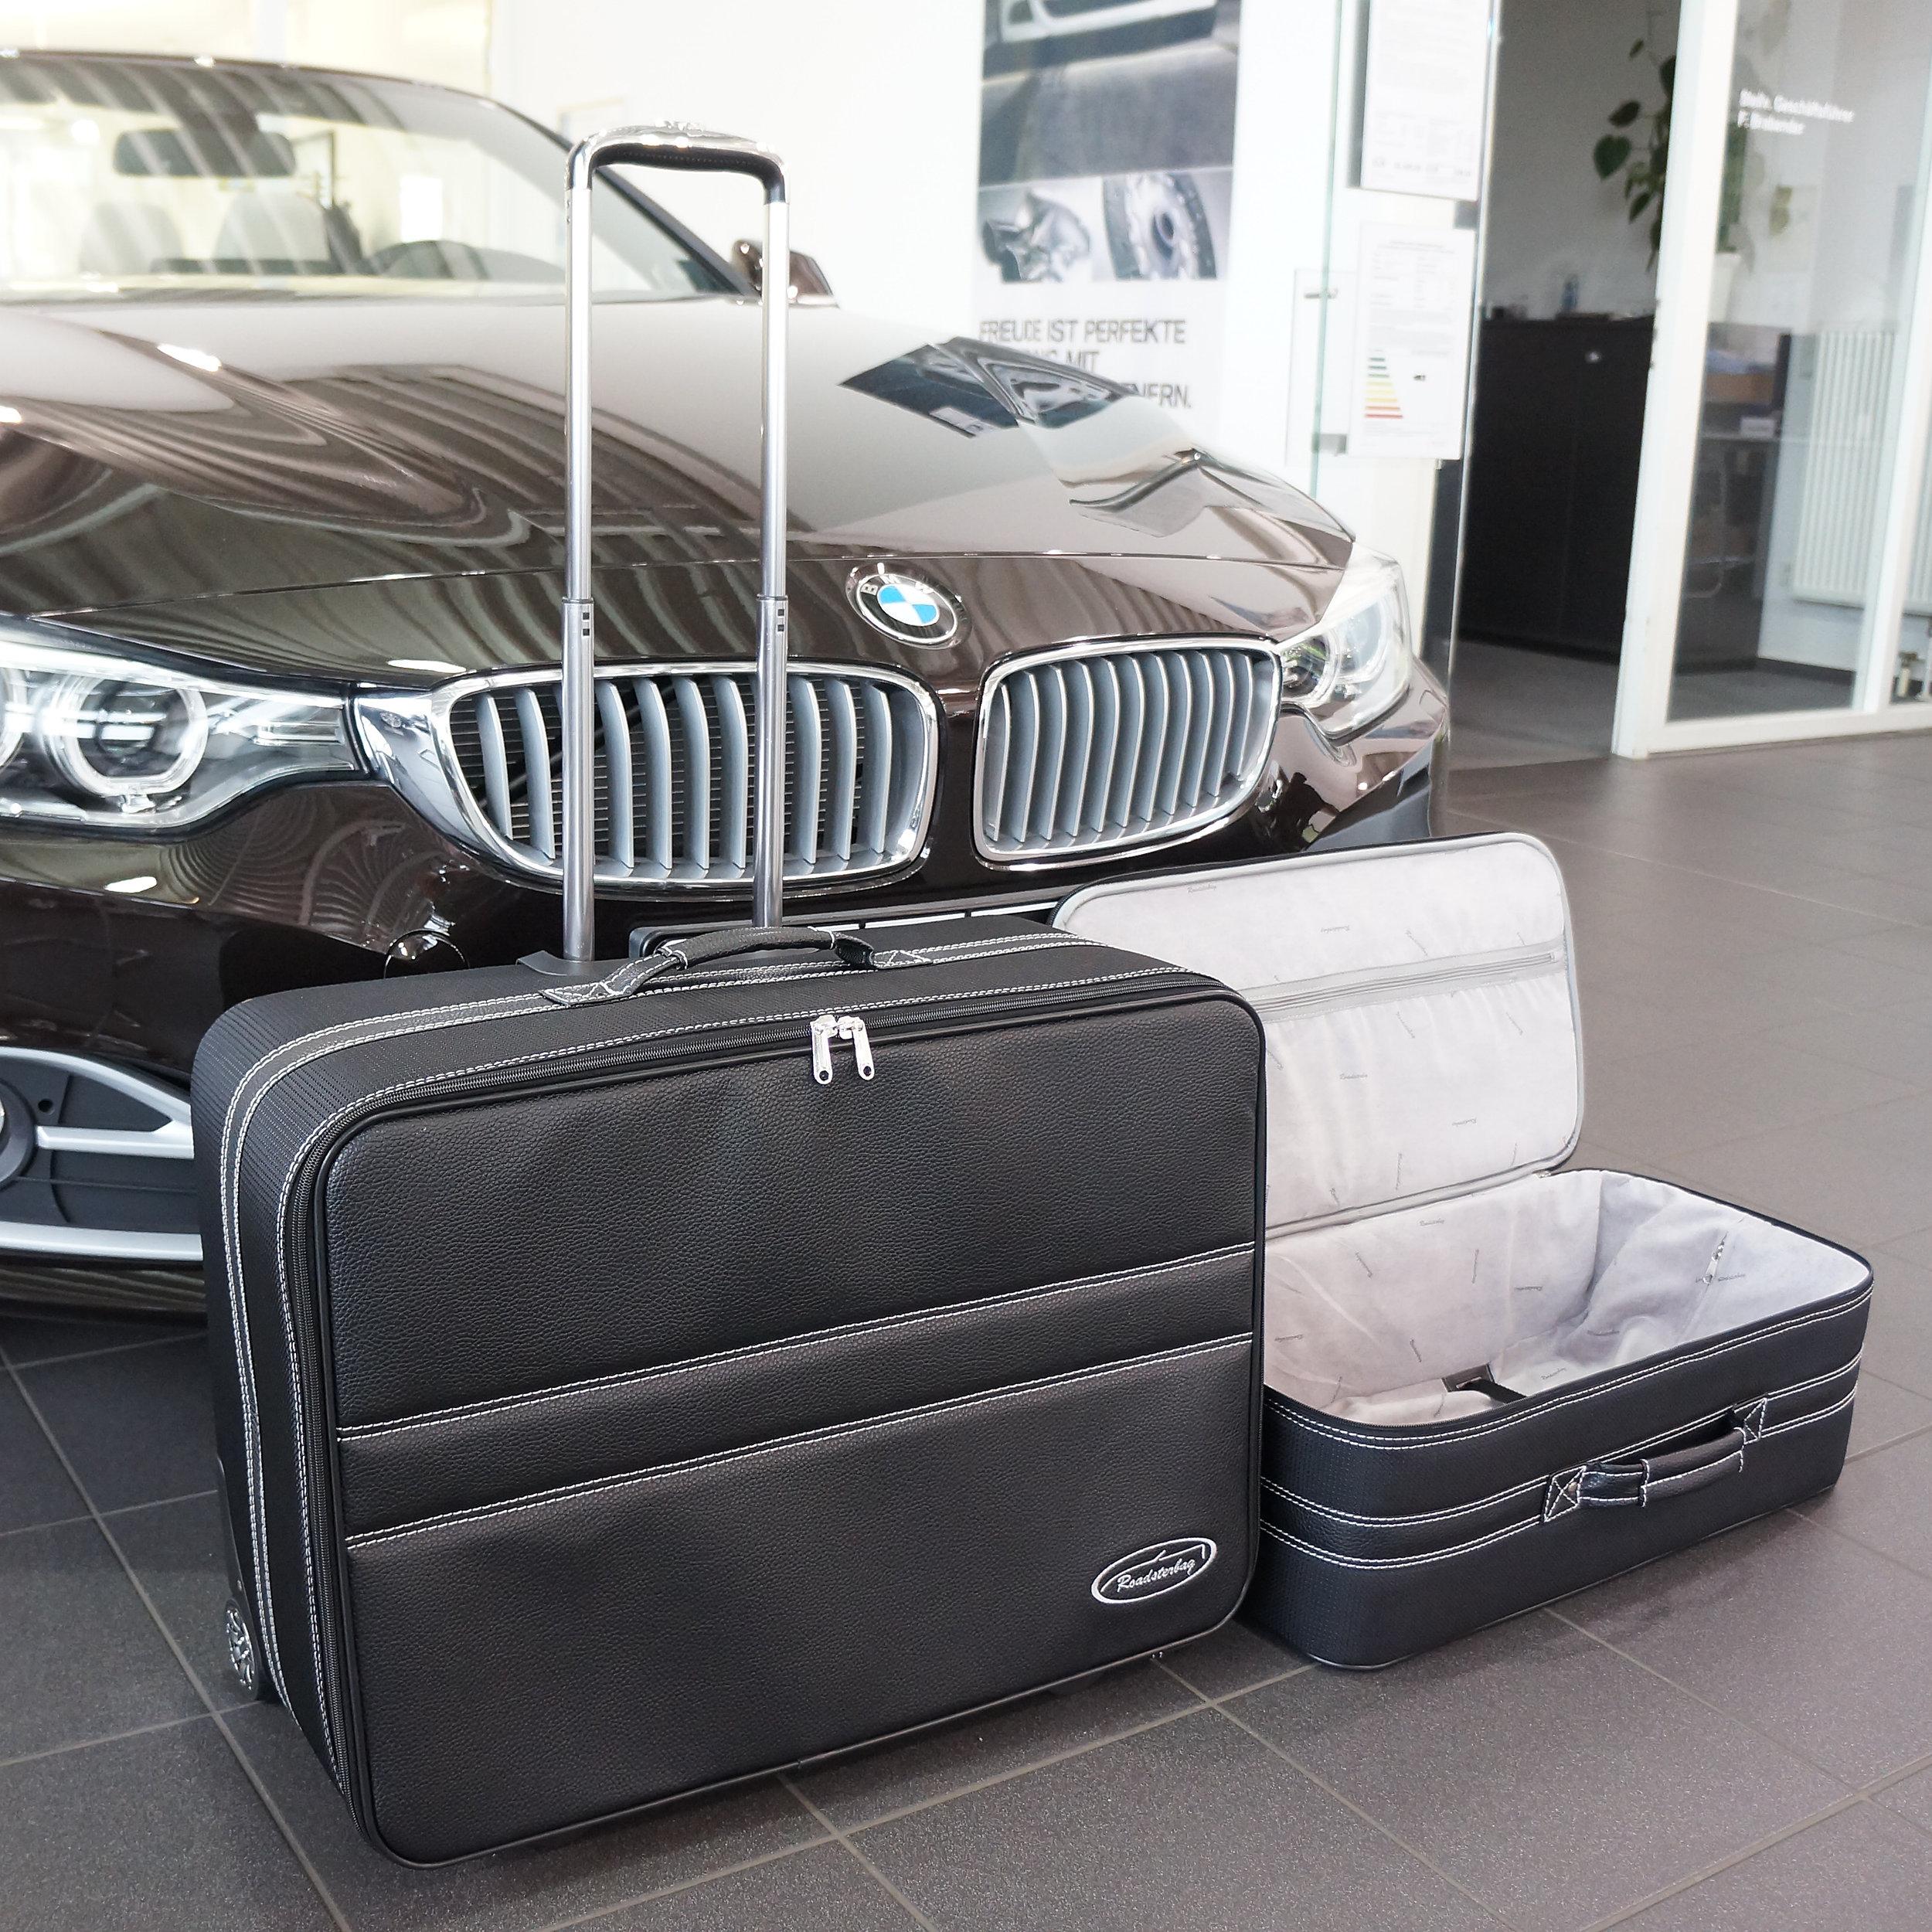 Luggage Set (Set of 2) with 2 wheels BMW 4er Cabrio (F33) 111 Liter